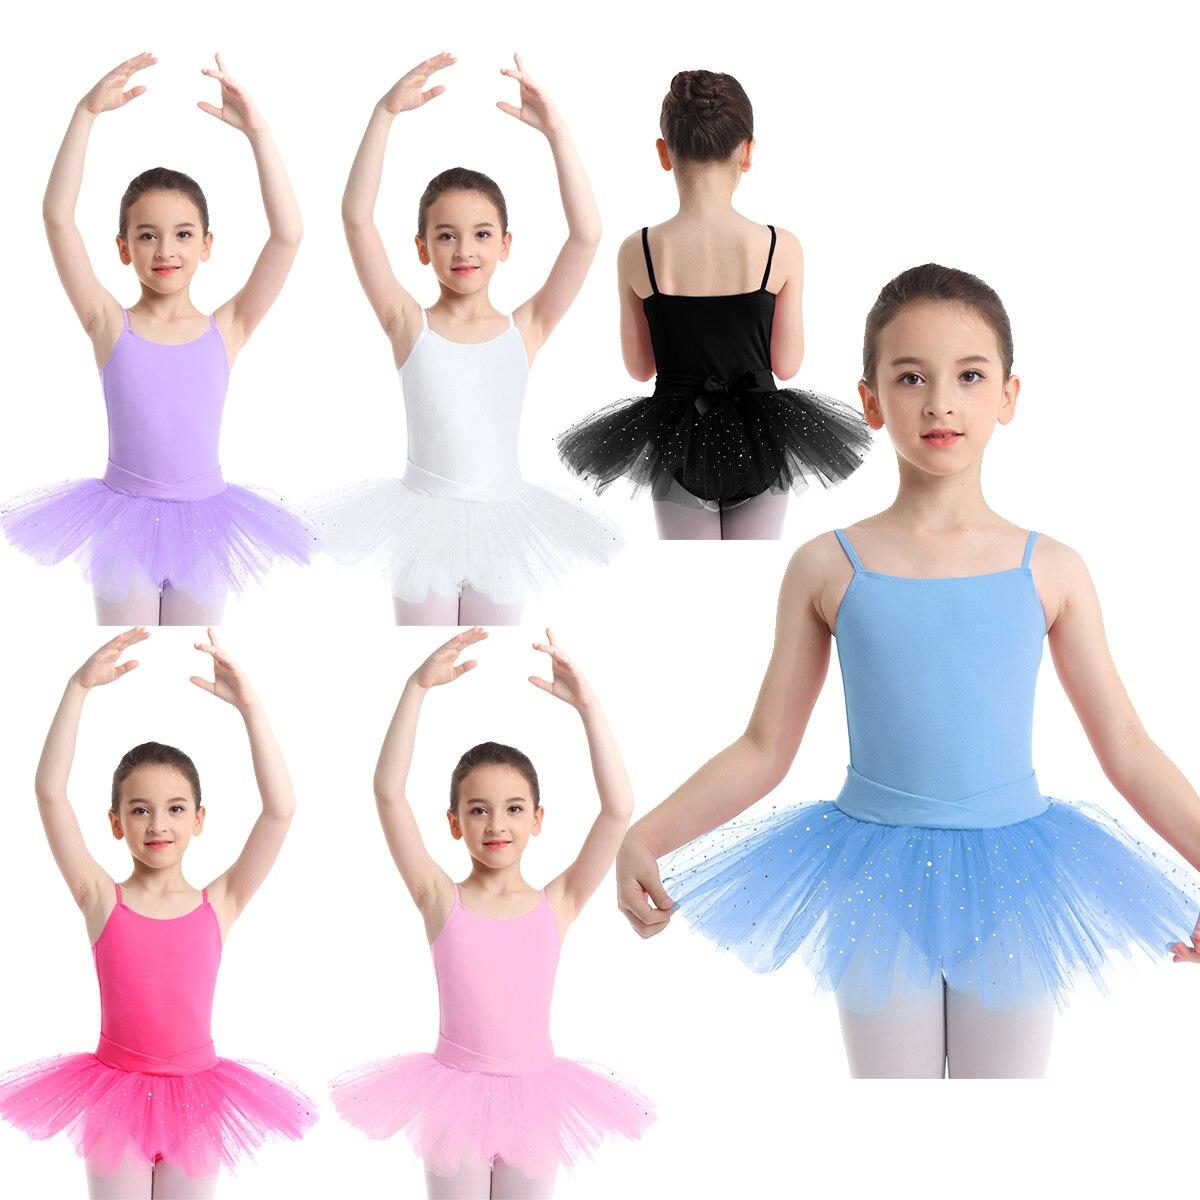 Dance Ballet Tutu Skirt with Underwear Women Girls Practice Costume Dancewear